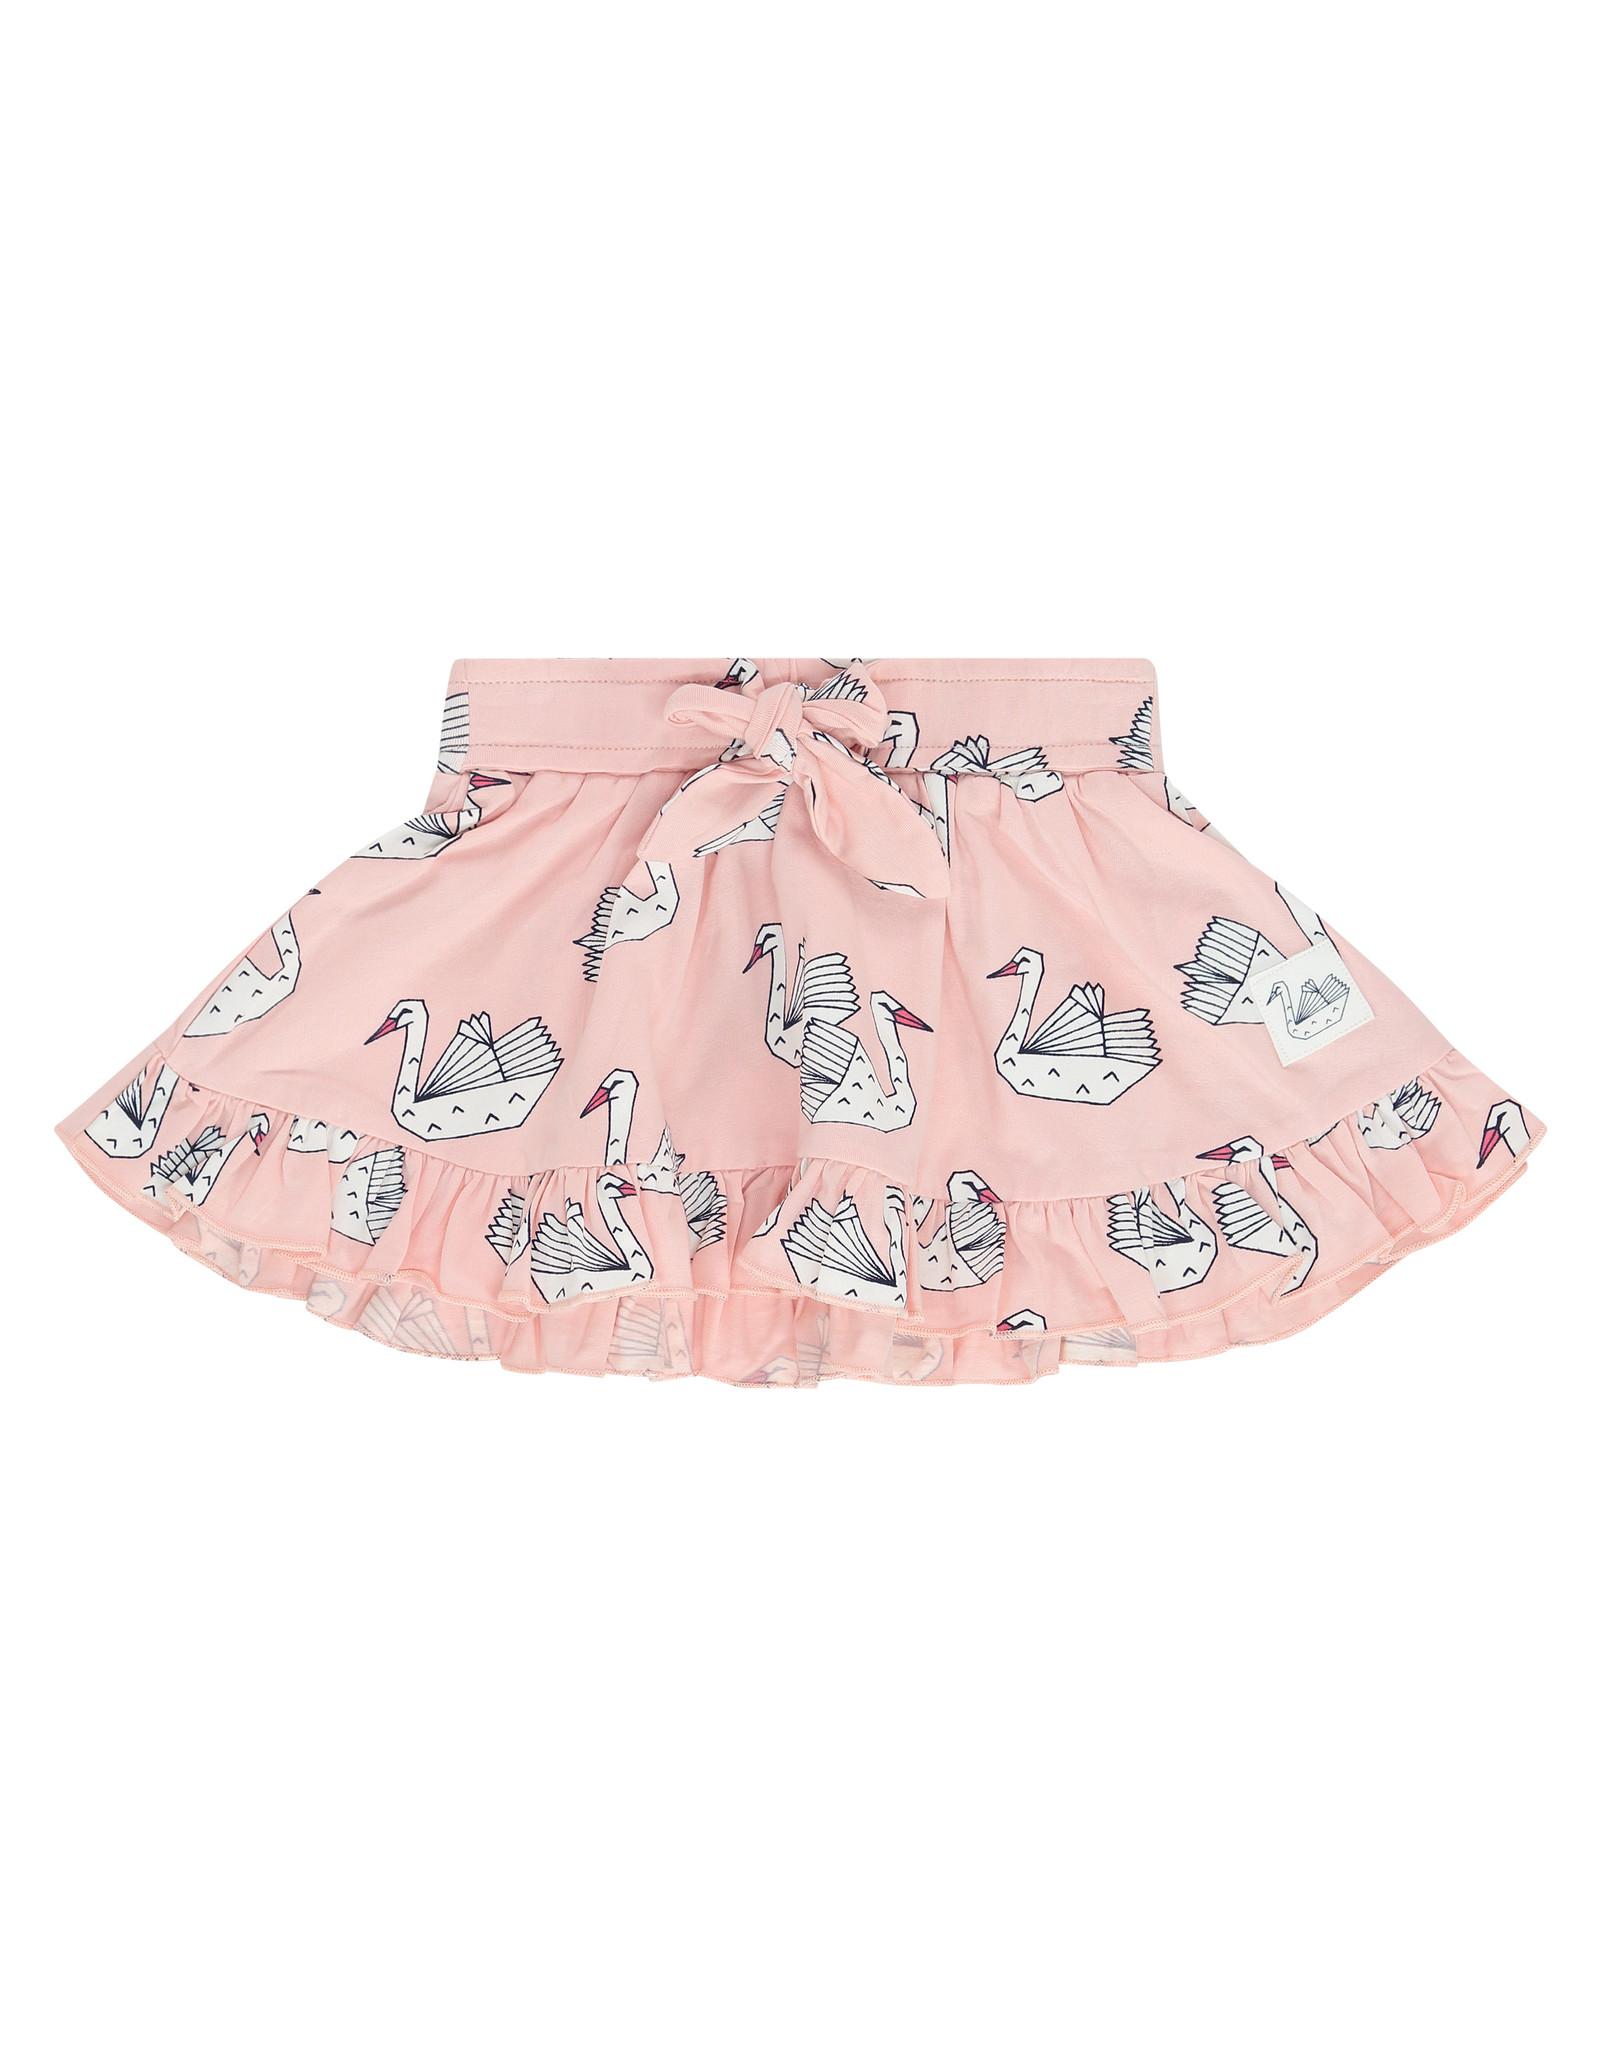 Babyface girls skirt, blush pink, BBE21208840